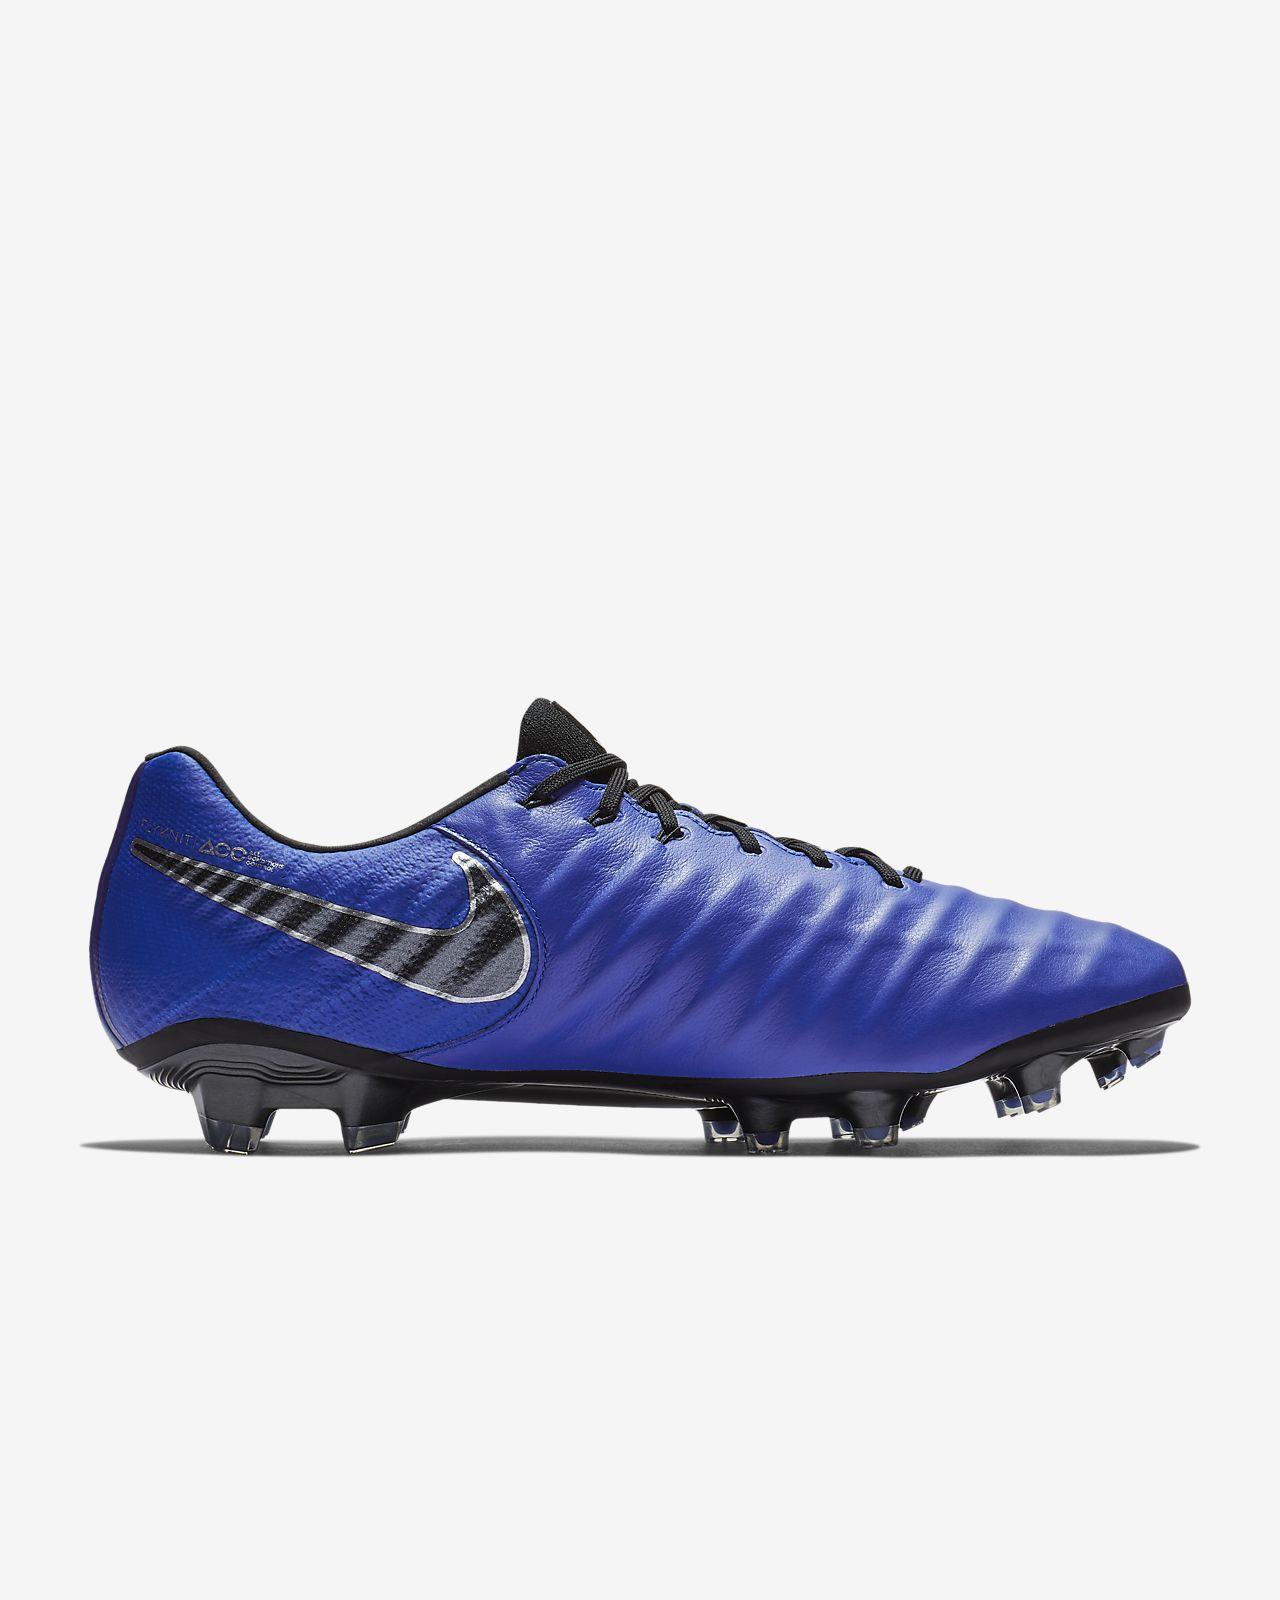 2ef5b8ffc Nike Tiempo Legend 7 Elite FG Firm-Ground Football Boot. Nike.com GB